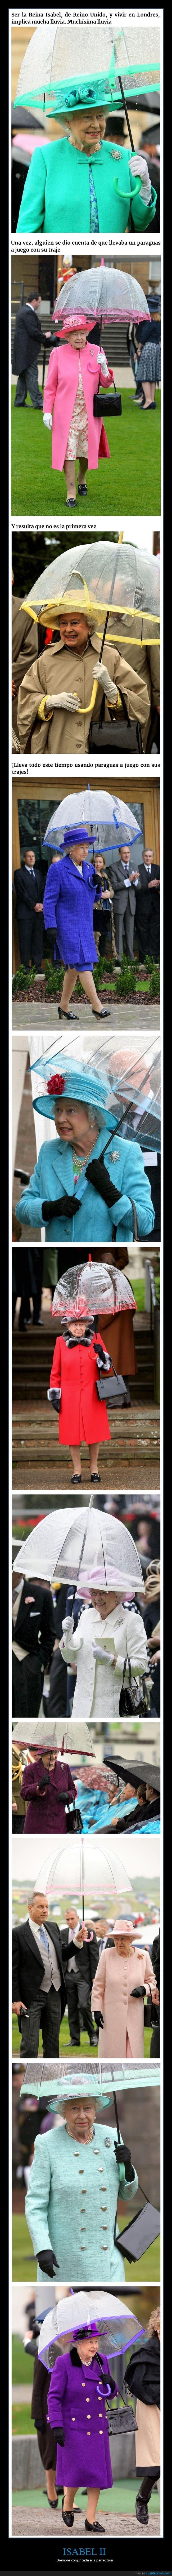 conjuntada,isabel ii,paraguas